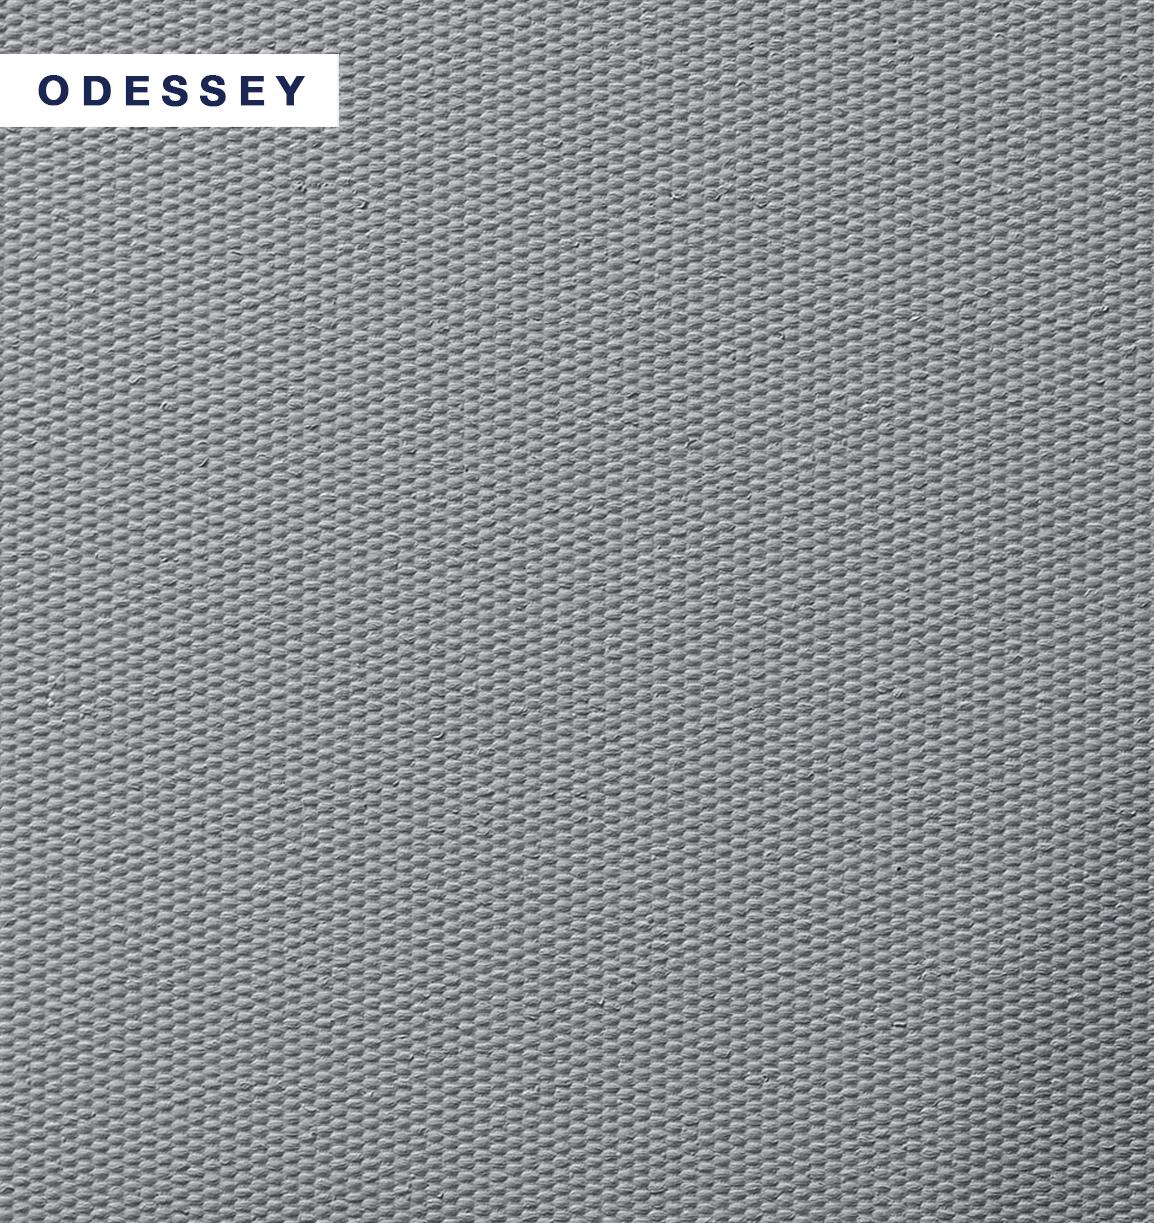 VIBE - Odessy.jpg